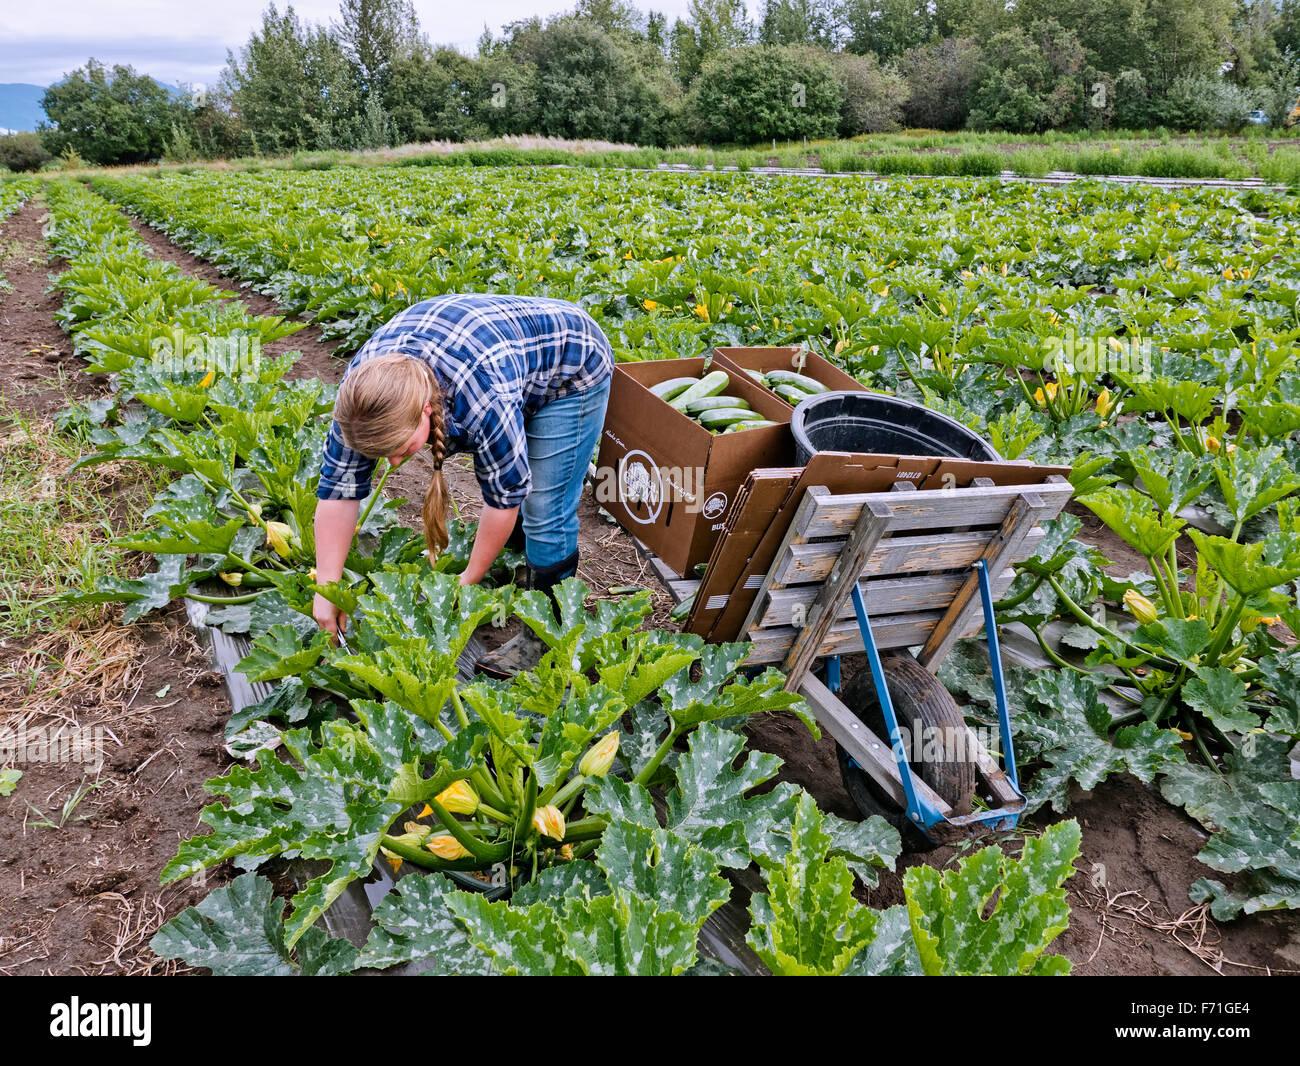 Farmer harvesting mature zucchini vegetable. - Stock Image